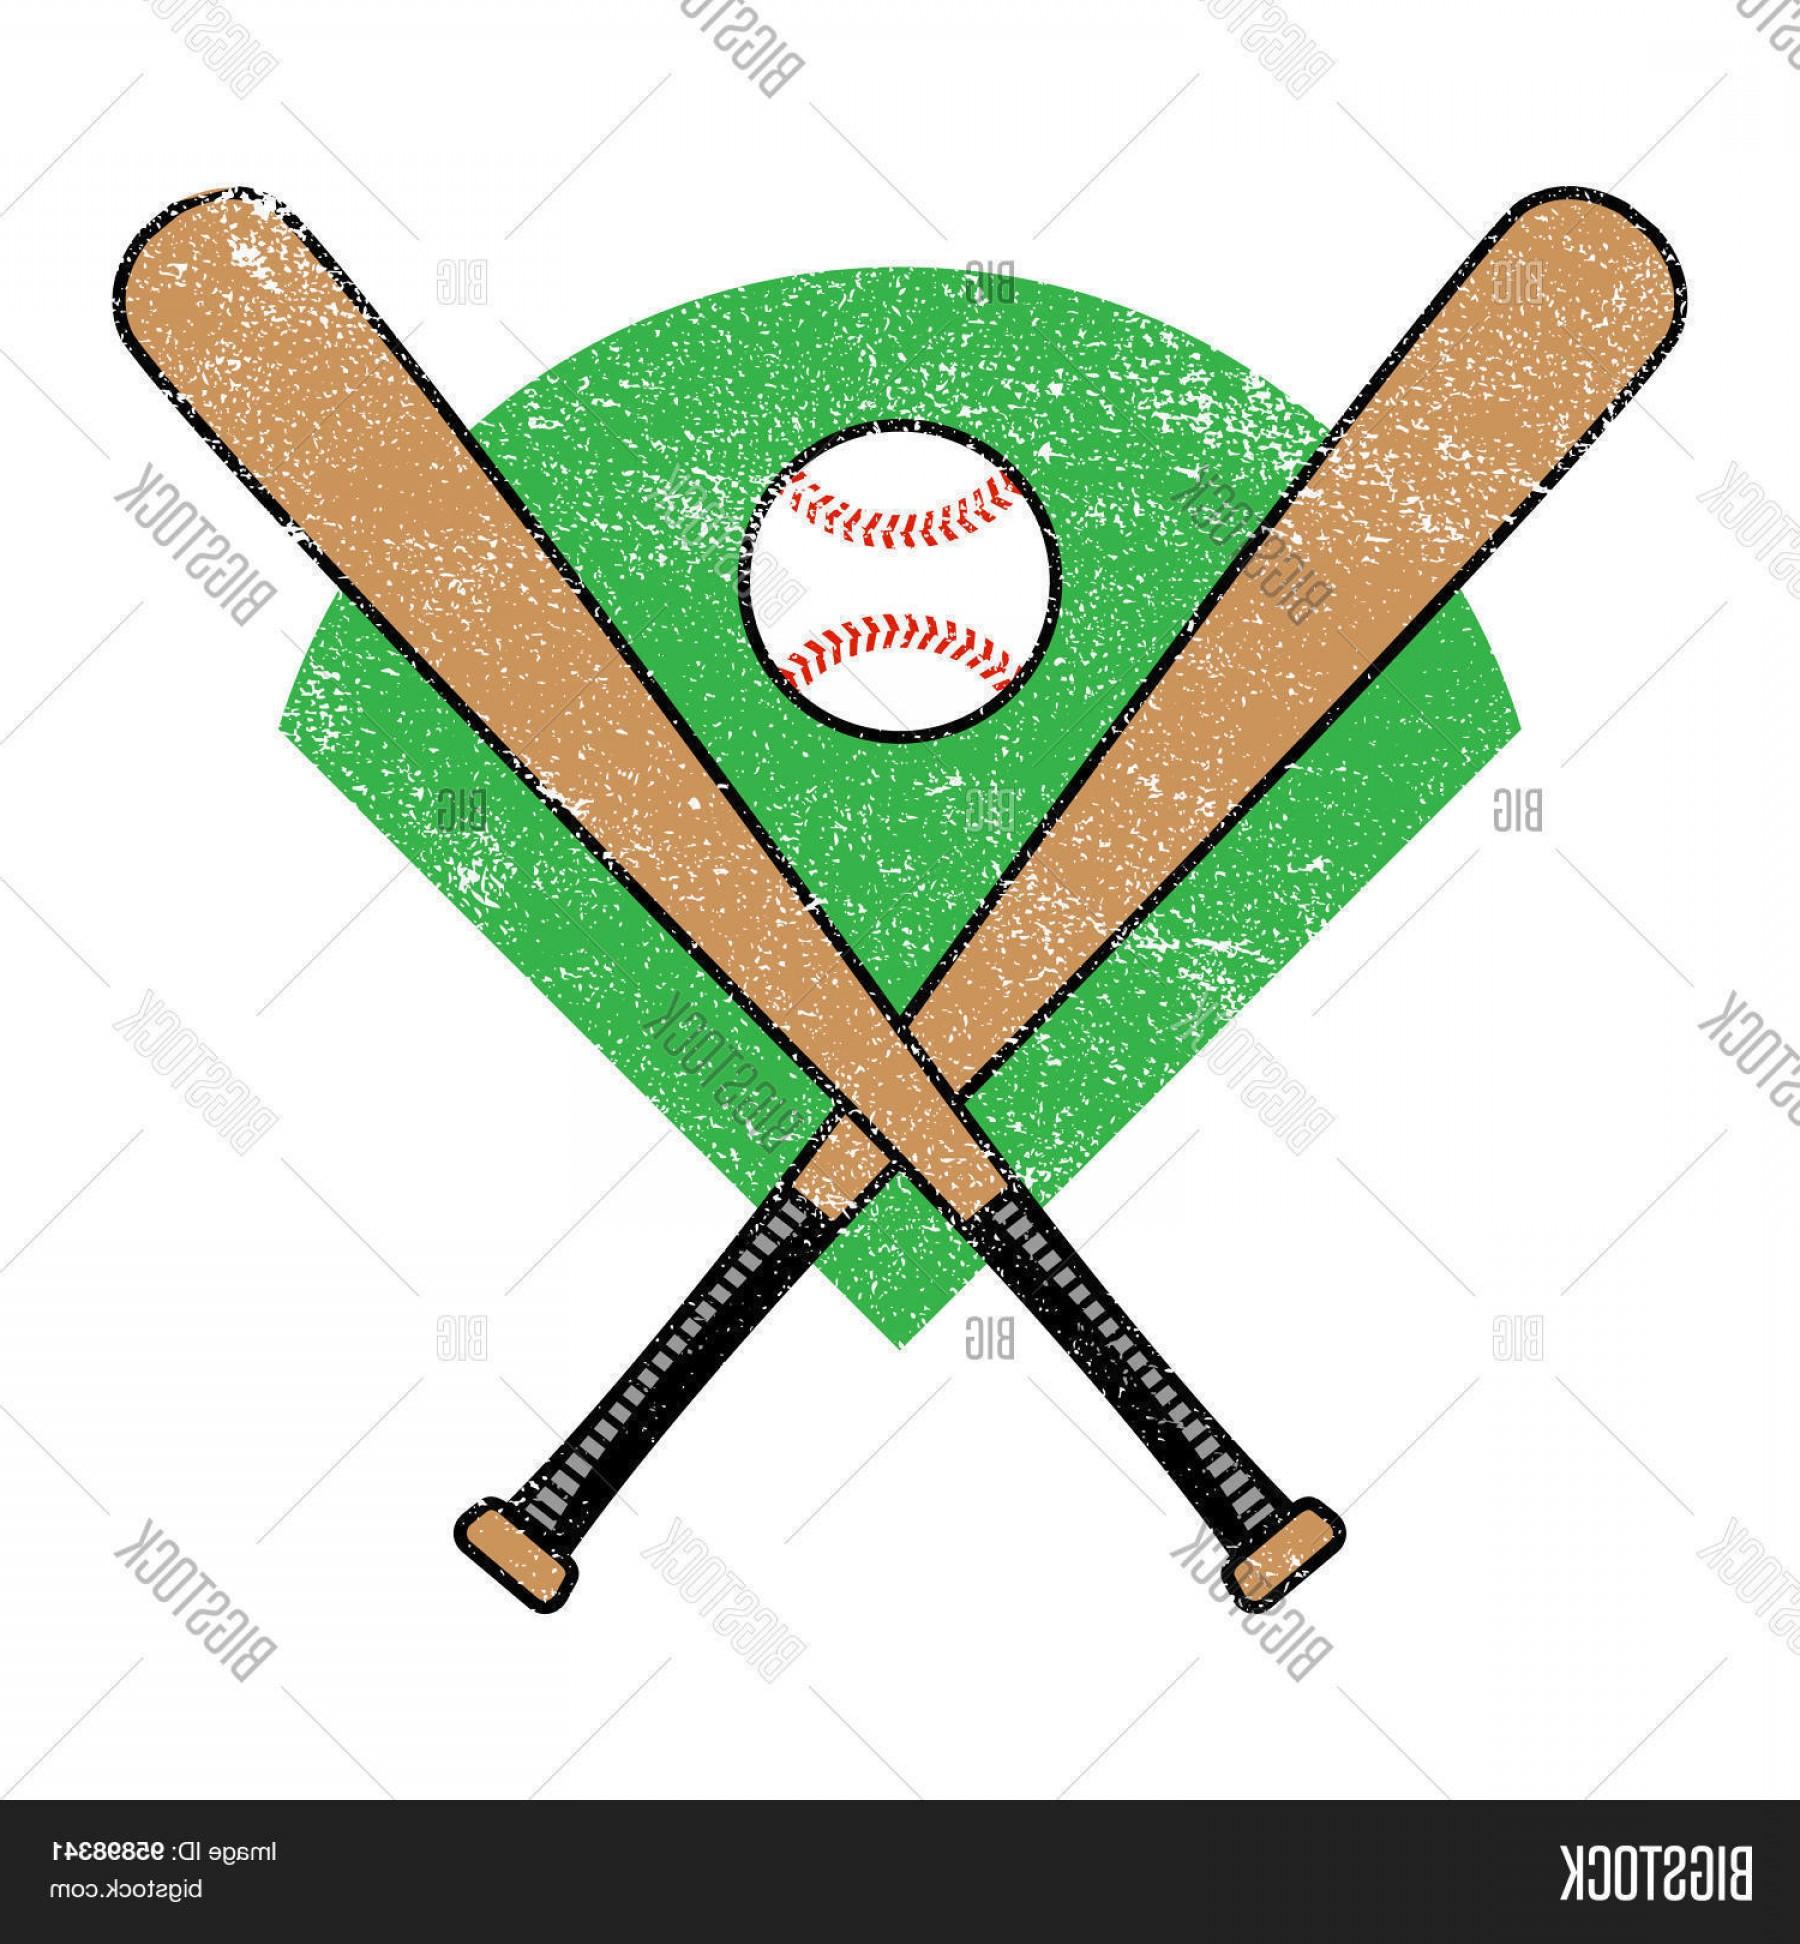 1800x1944 Stock Vector Baseball Bat And Ball Arenawp